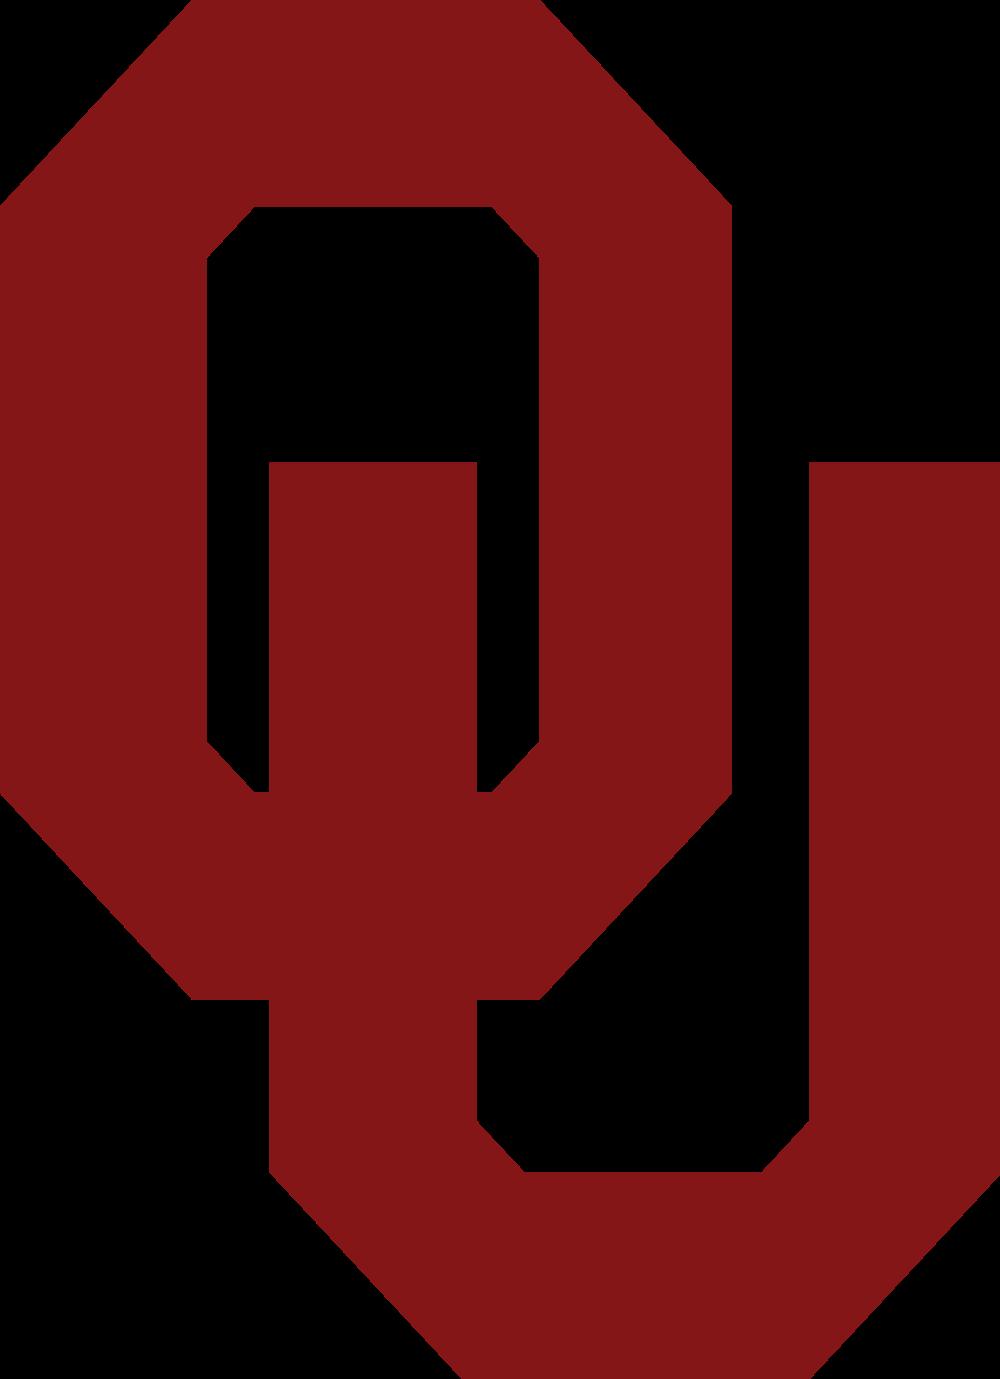 University of oklahoma sooners. Dallas cowboys clipart girly